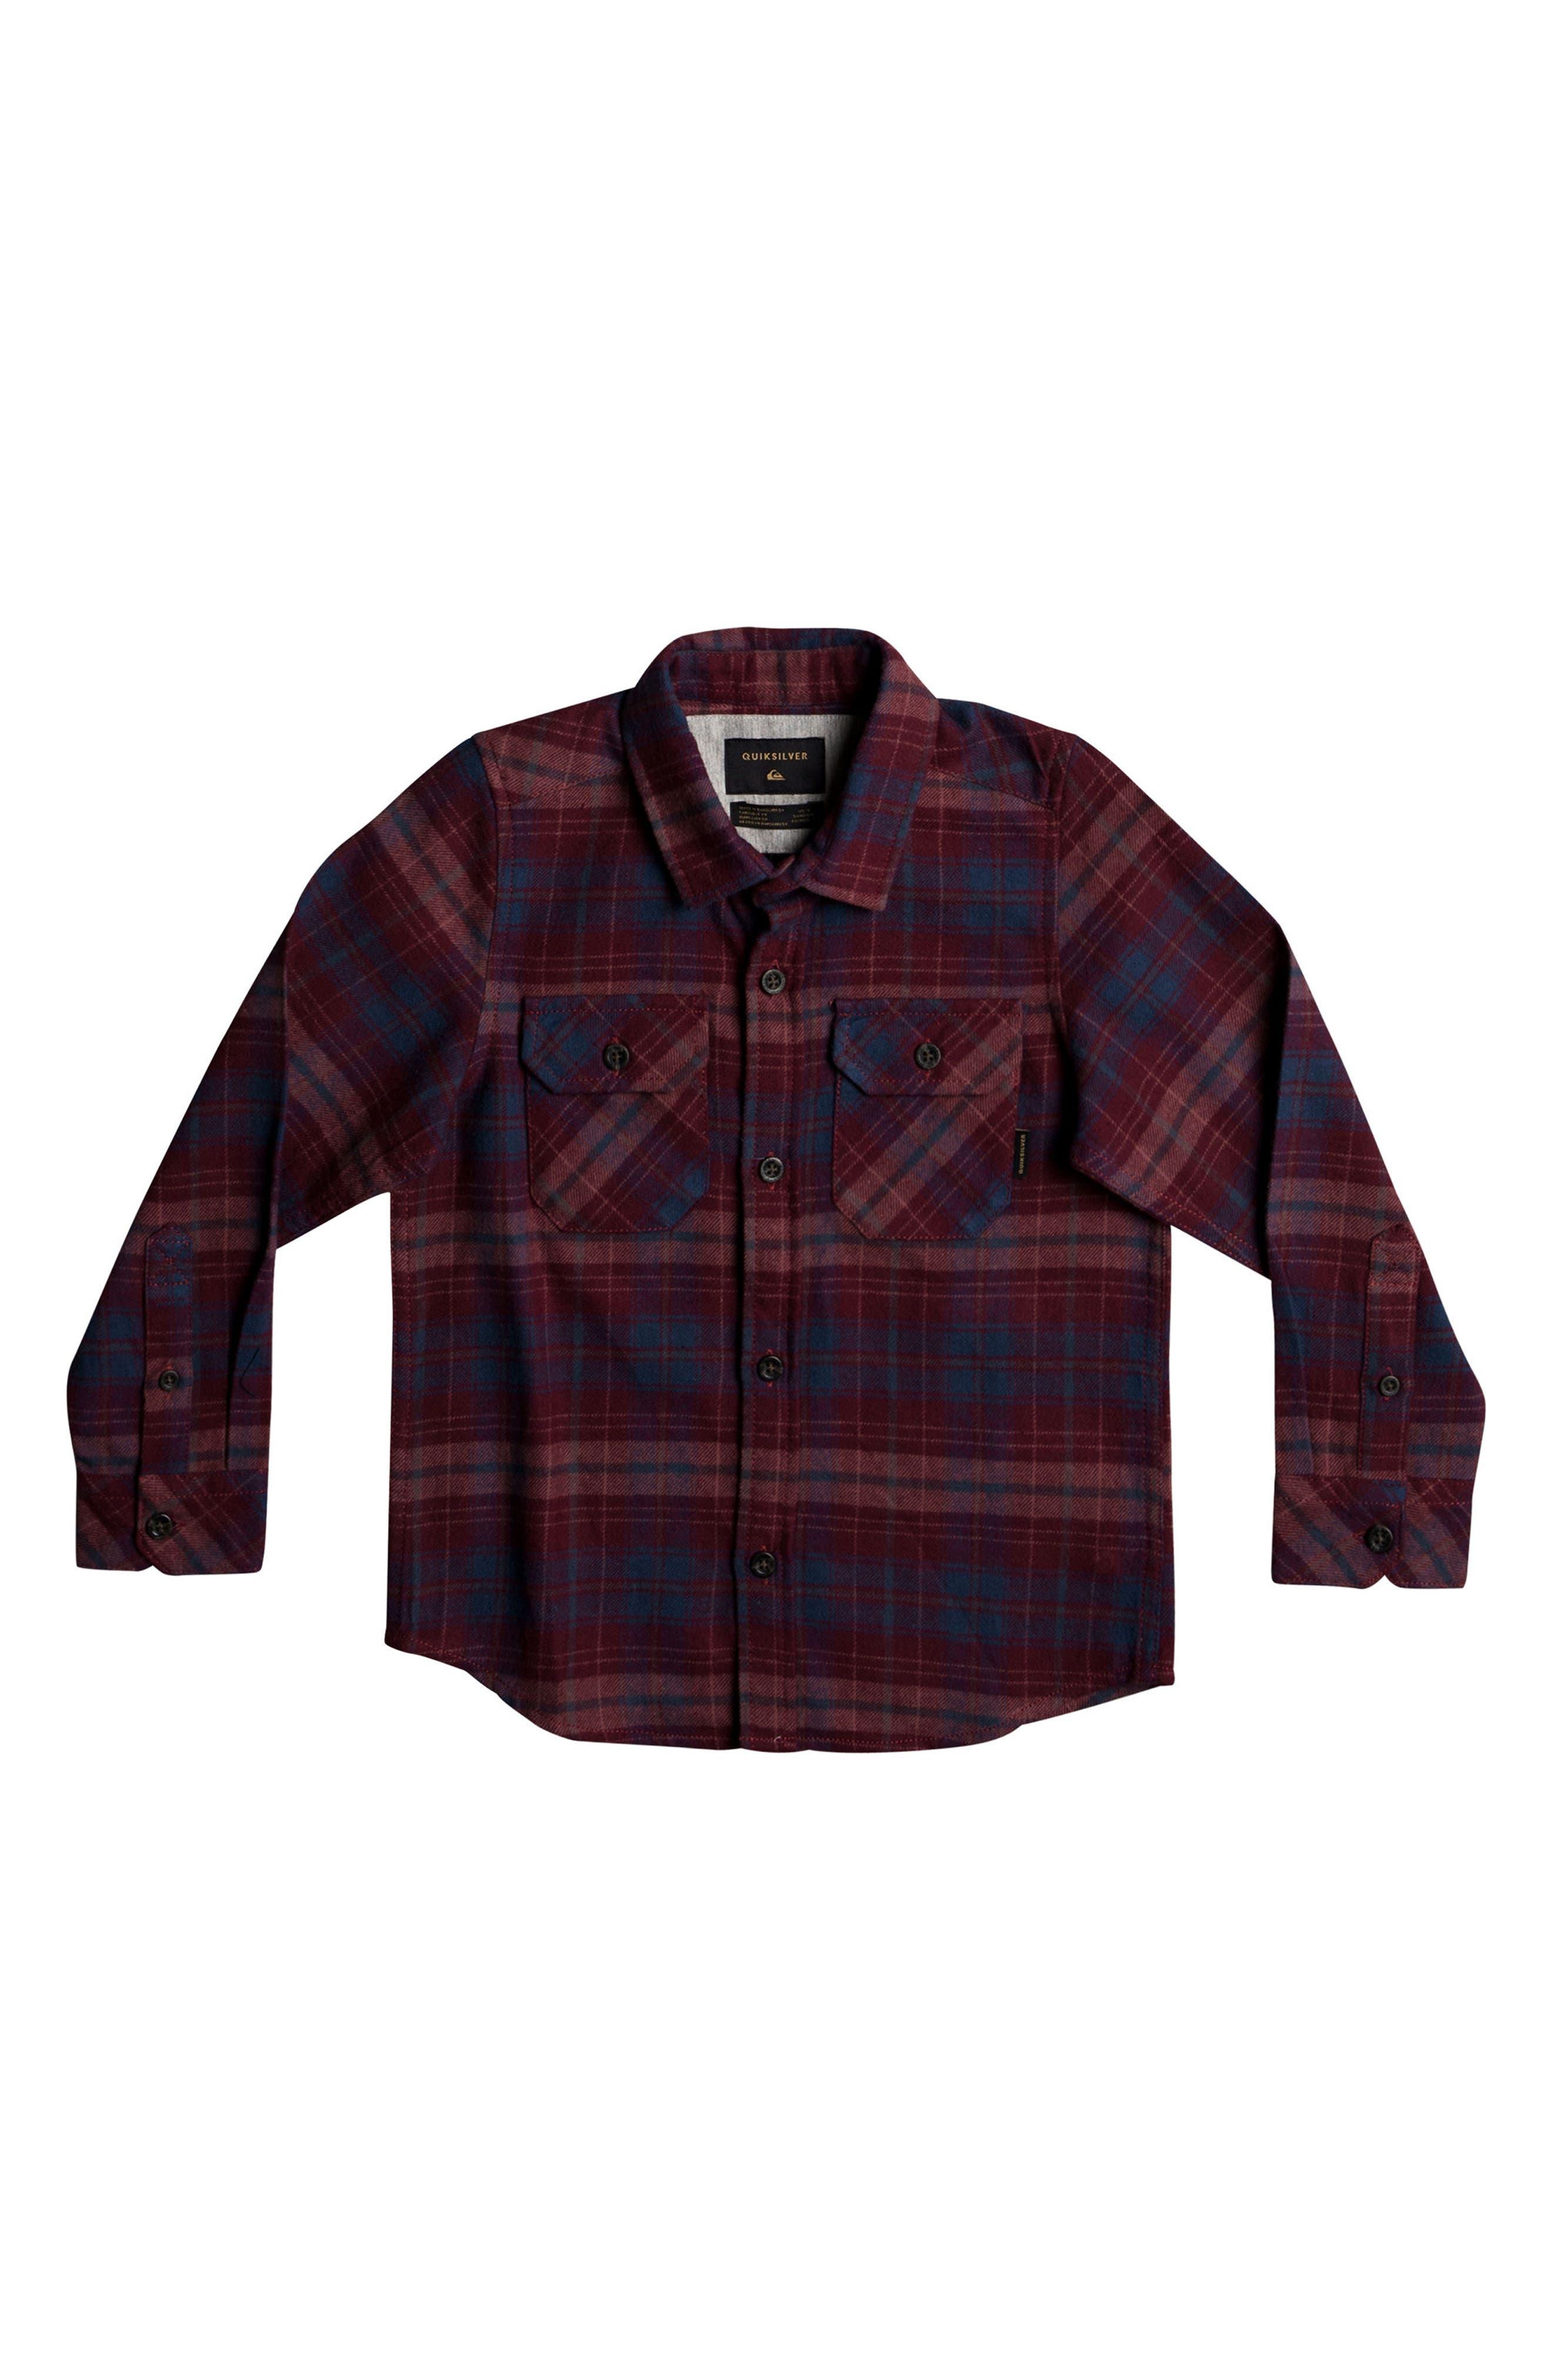 Quiksilver Fitzspeere Plaid Flannel Shirt (Toddler Boys & Little Boys)